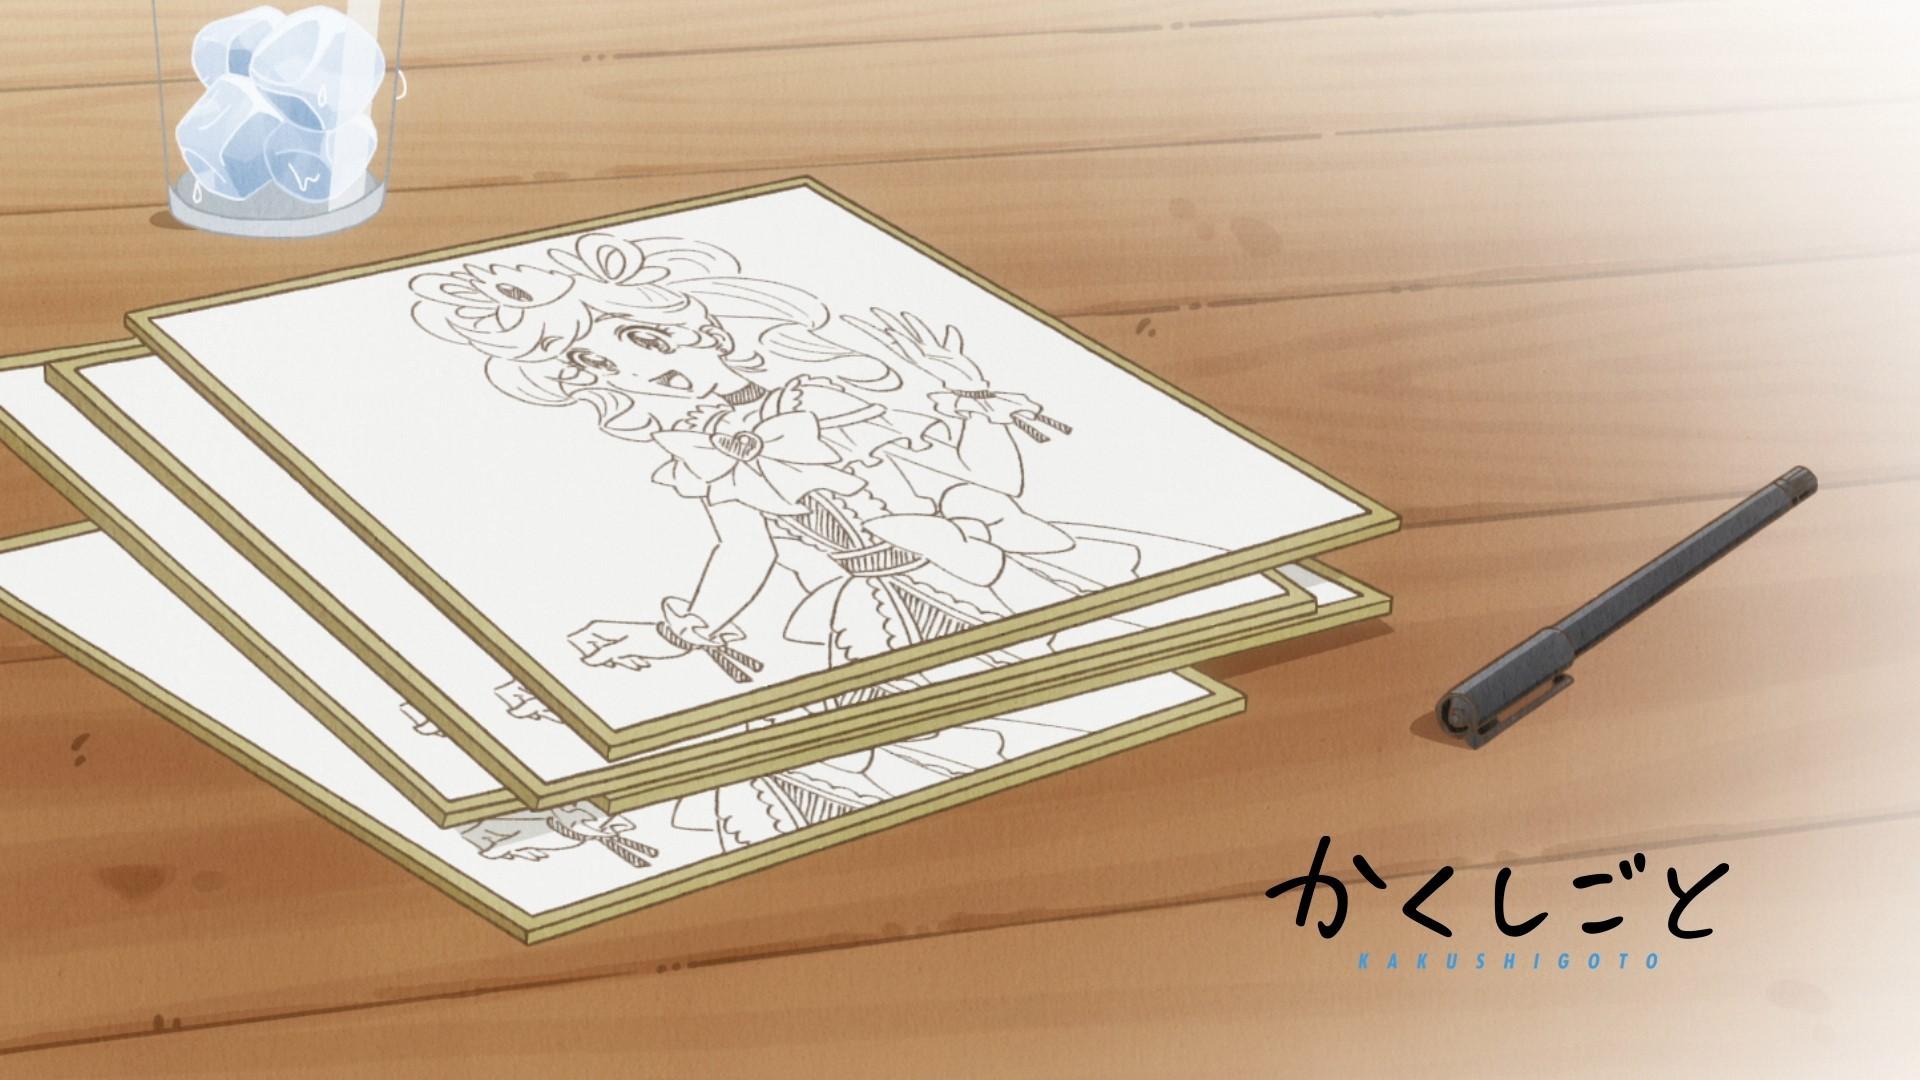 Kakushigoto Episode 01 Eyecatch 1